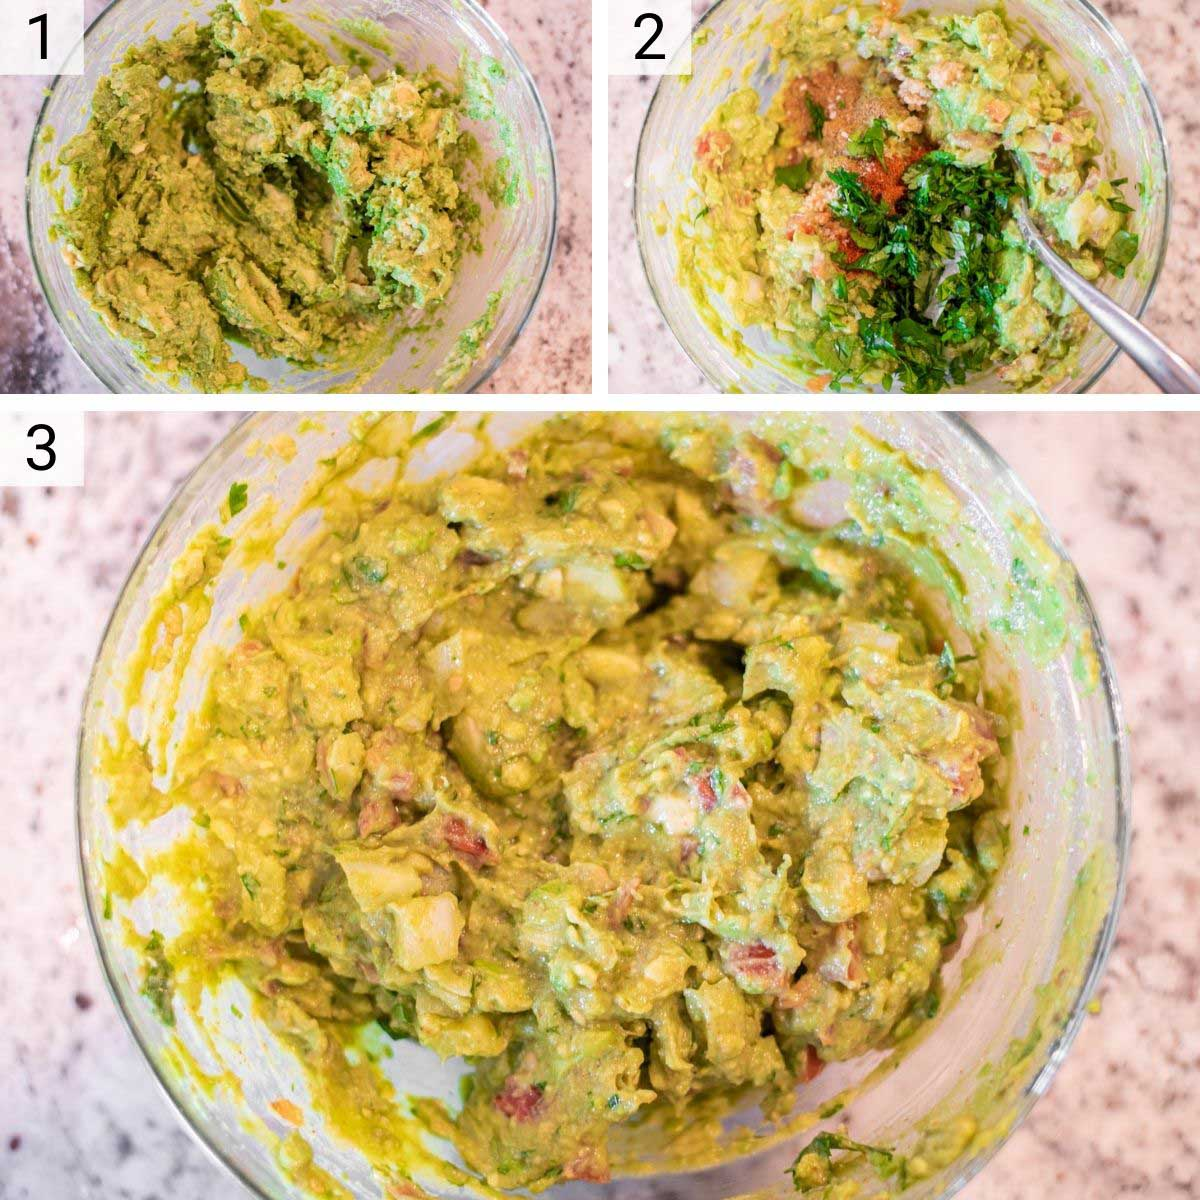 process shots of how to make guacamole